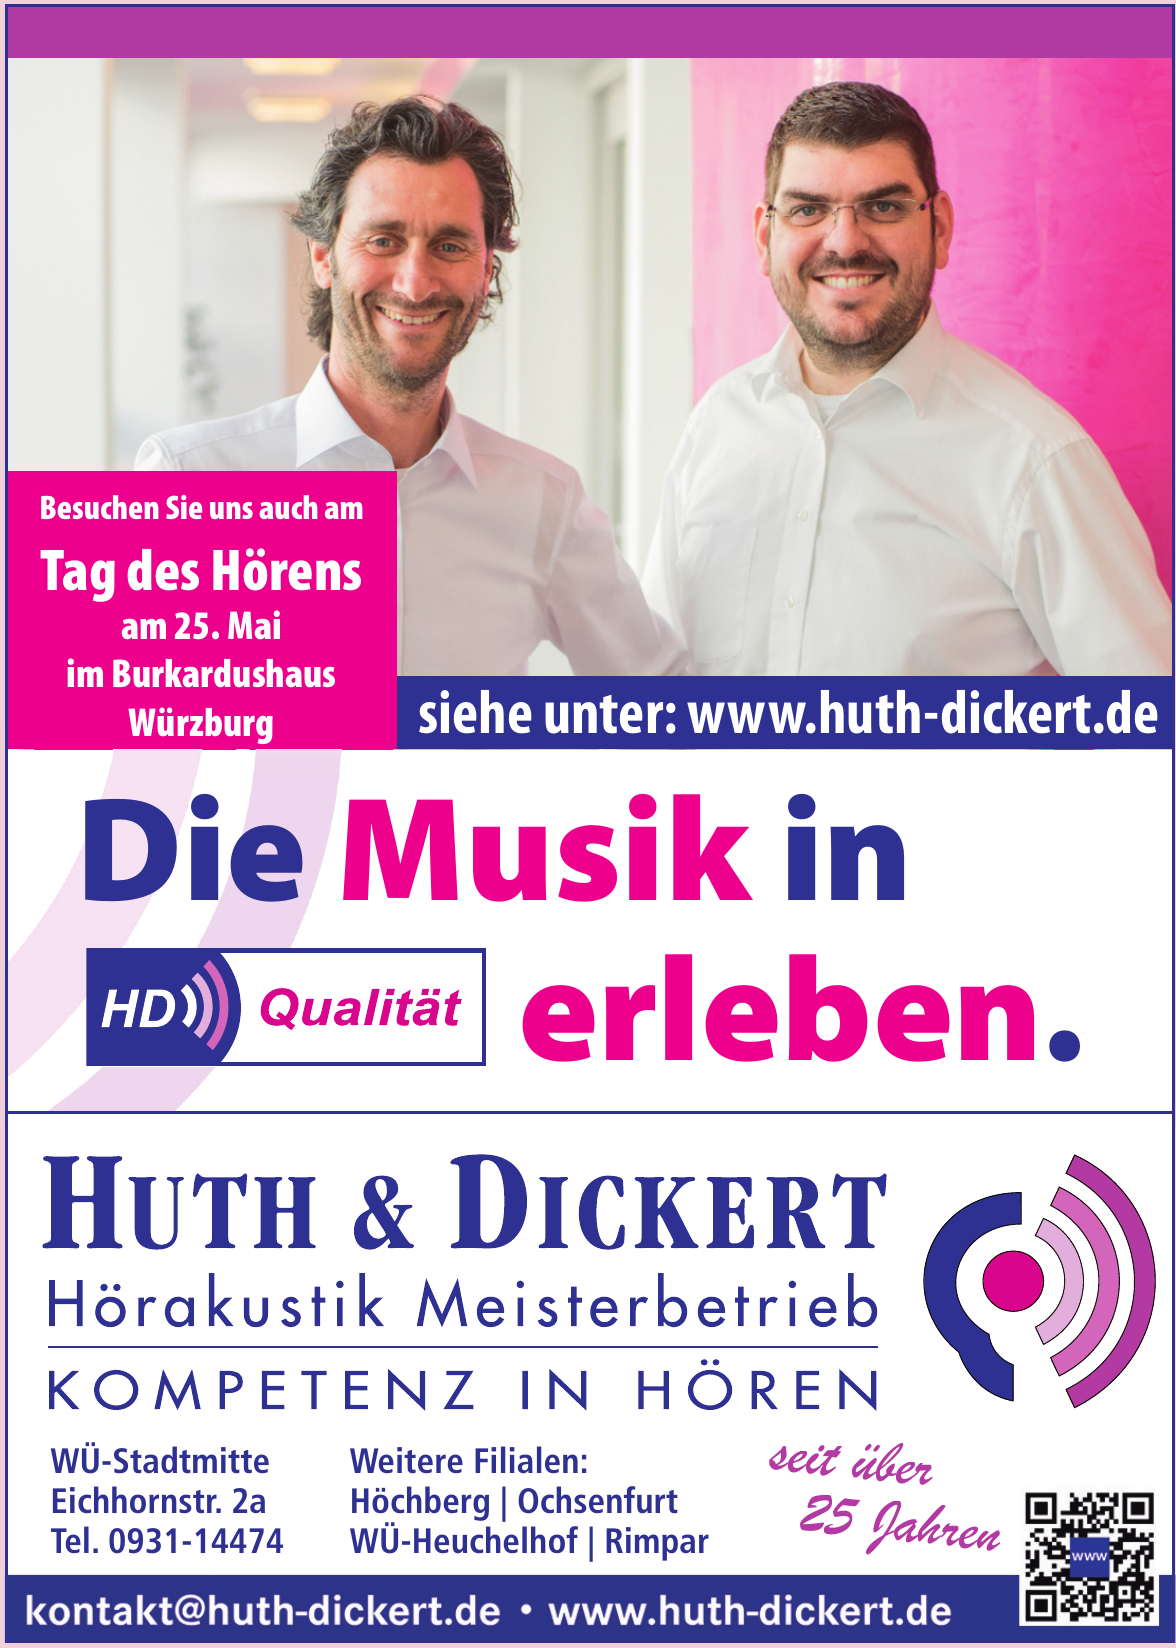 Huth & Dickert Hörgeräte Meisterbetrieb GmbH